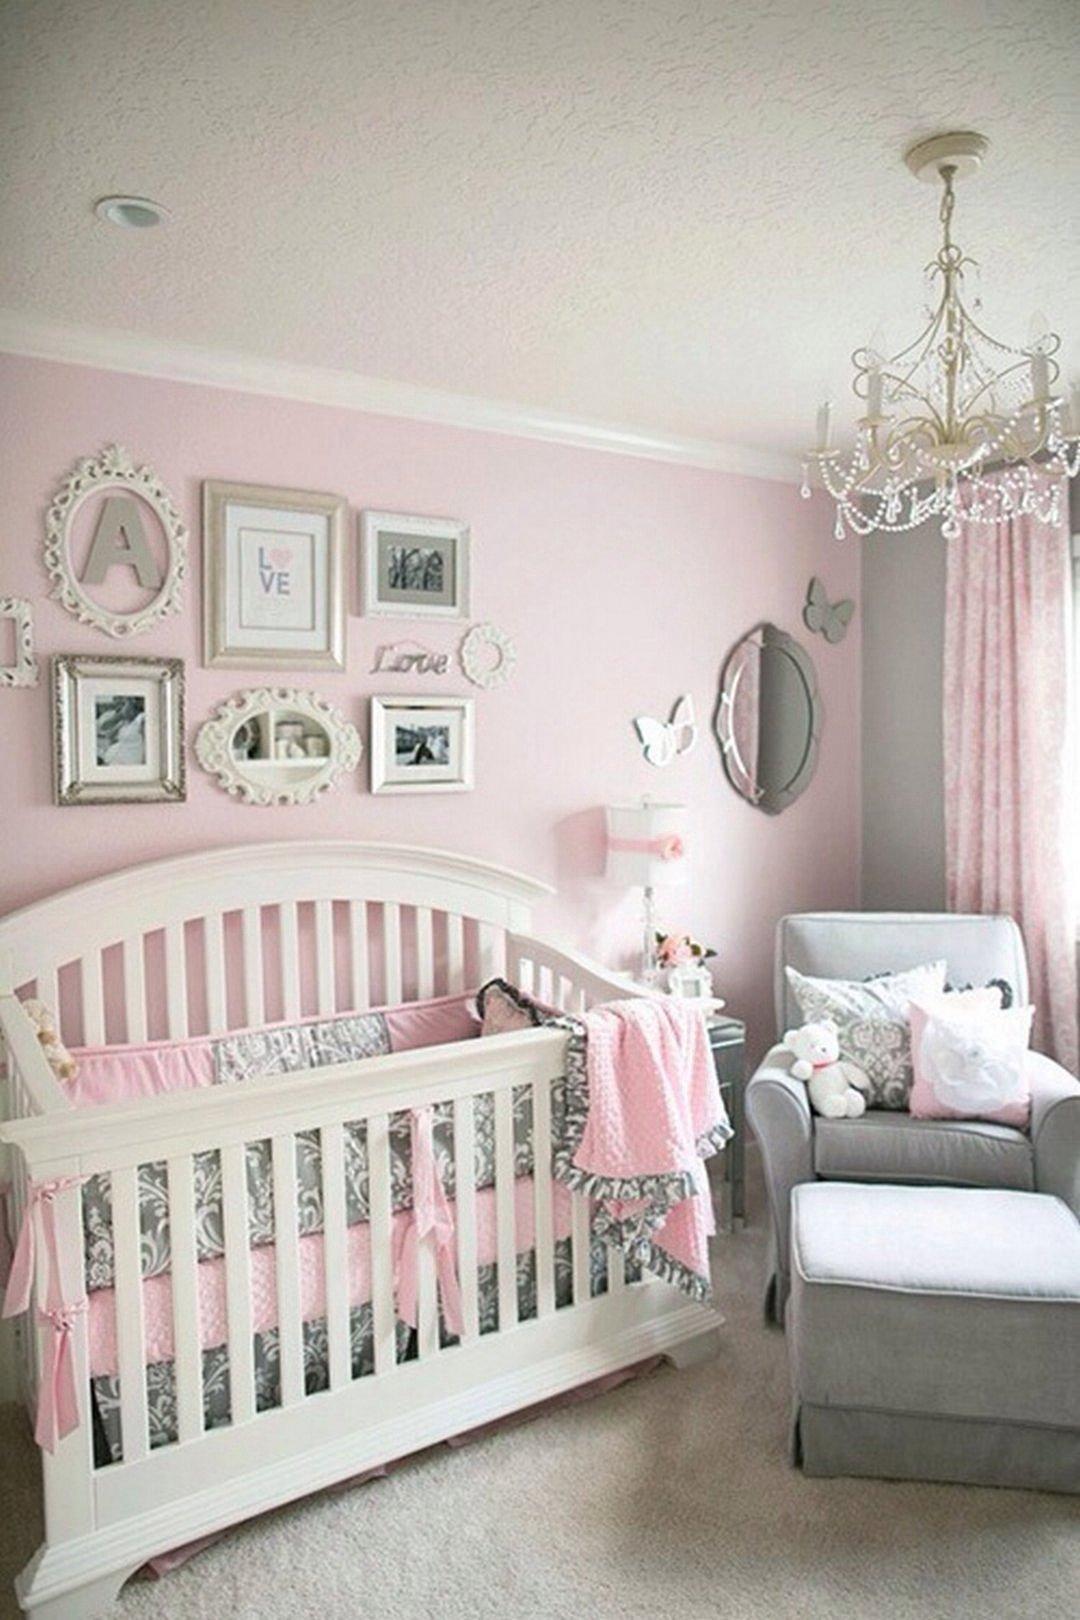 10 Cute Baby Room Ideas For A Girl 6 actionable tips on baby girl nursery nursery babies and girls 3 2020